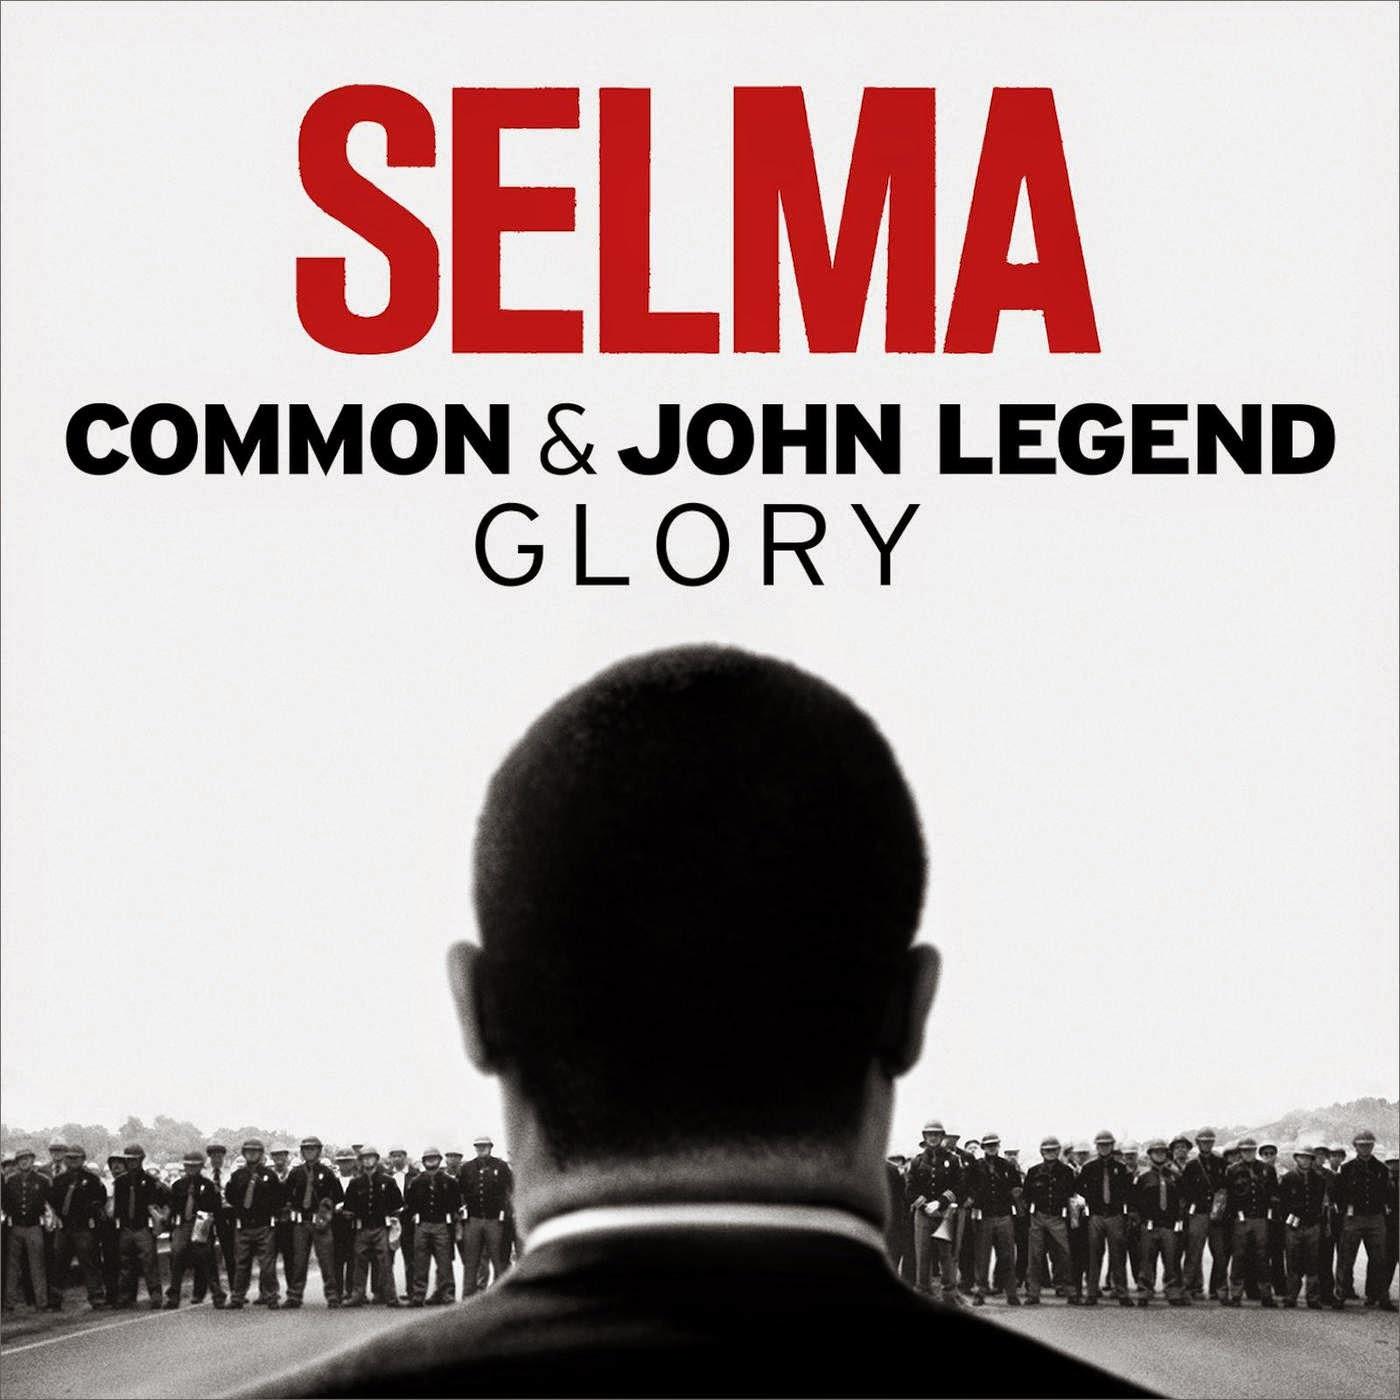 John Legend & Common